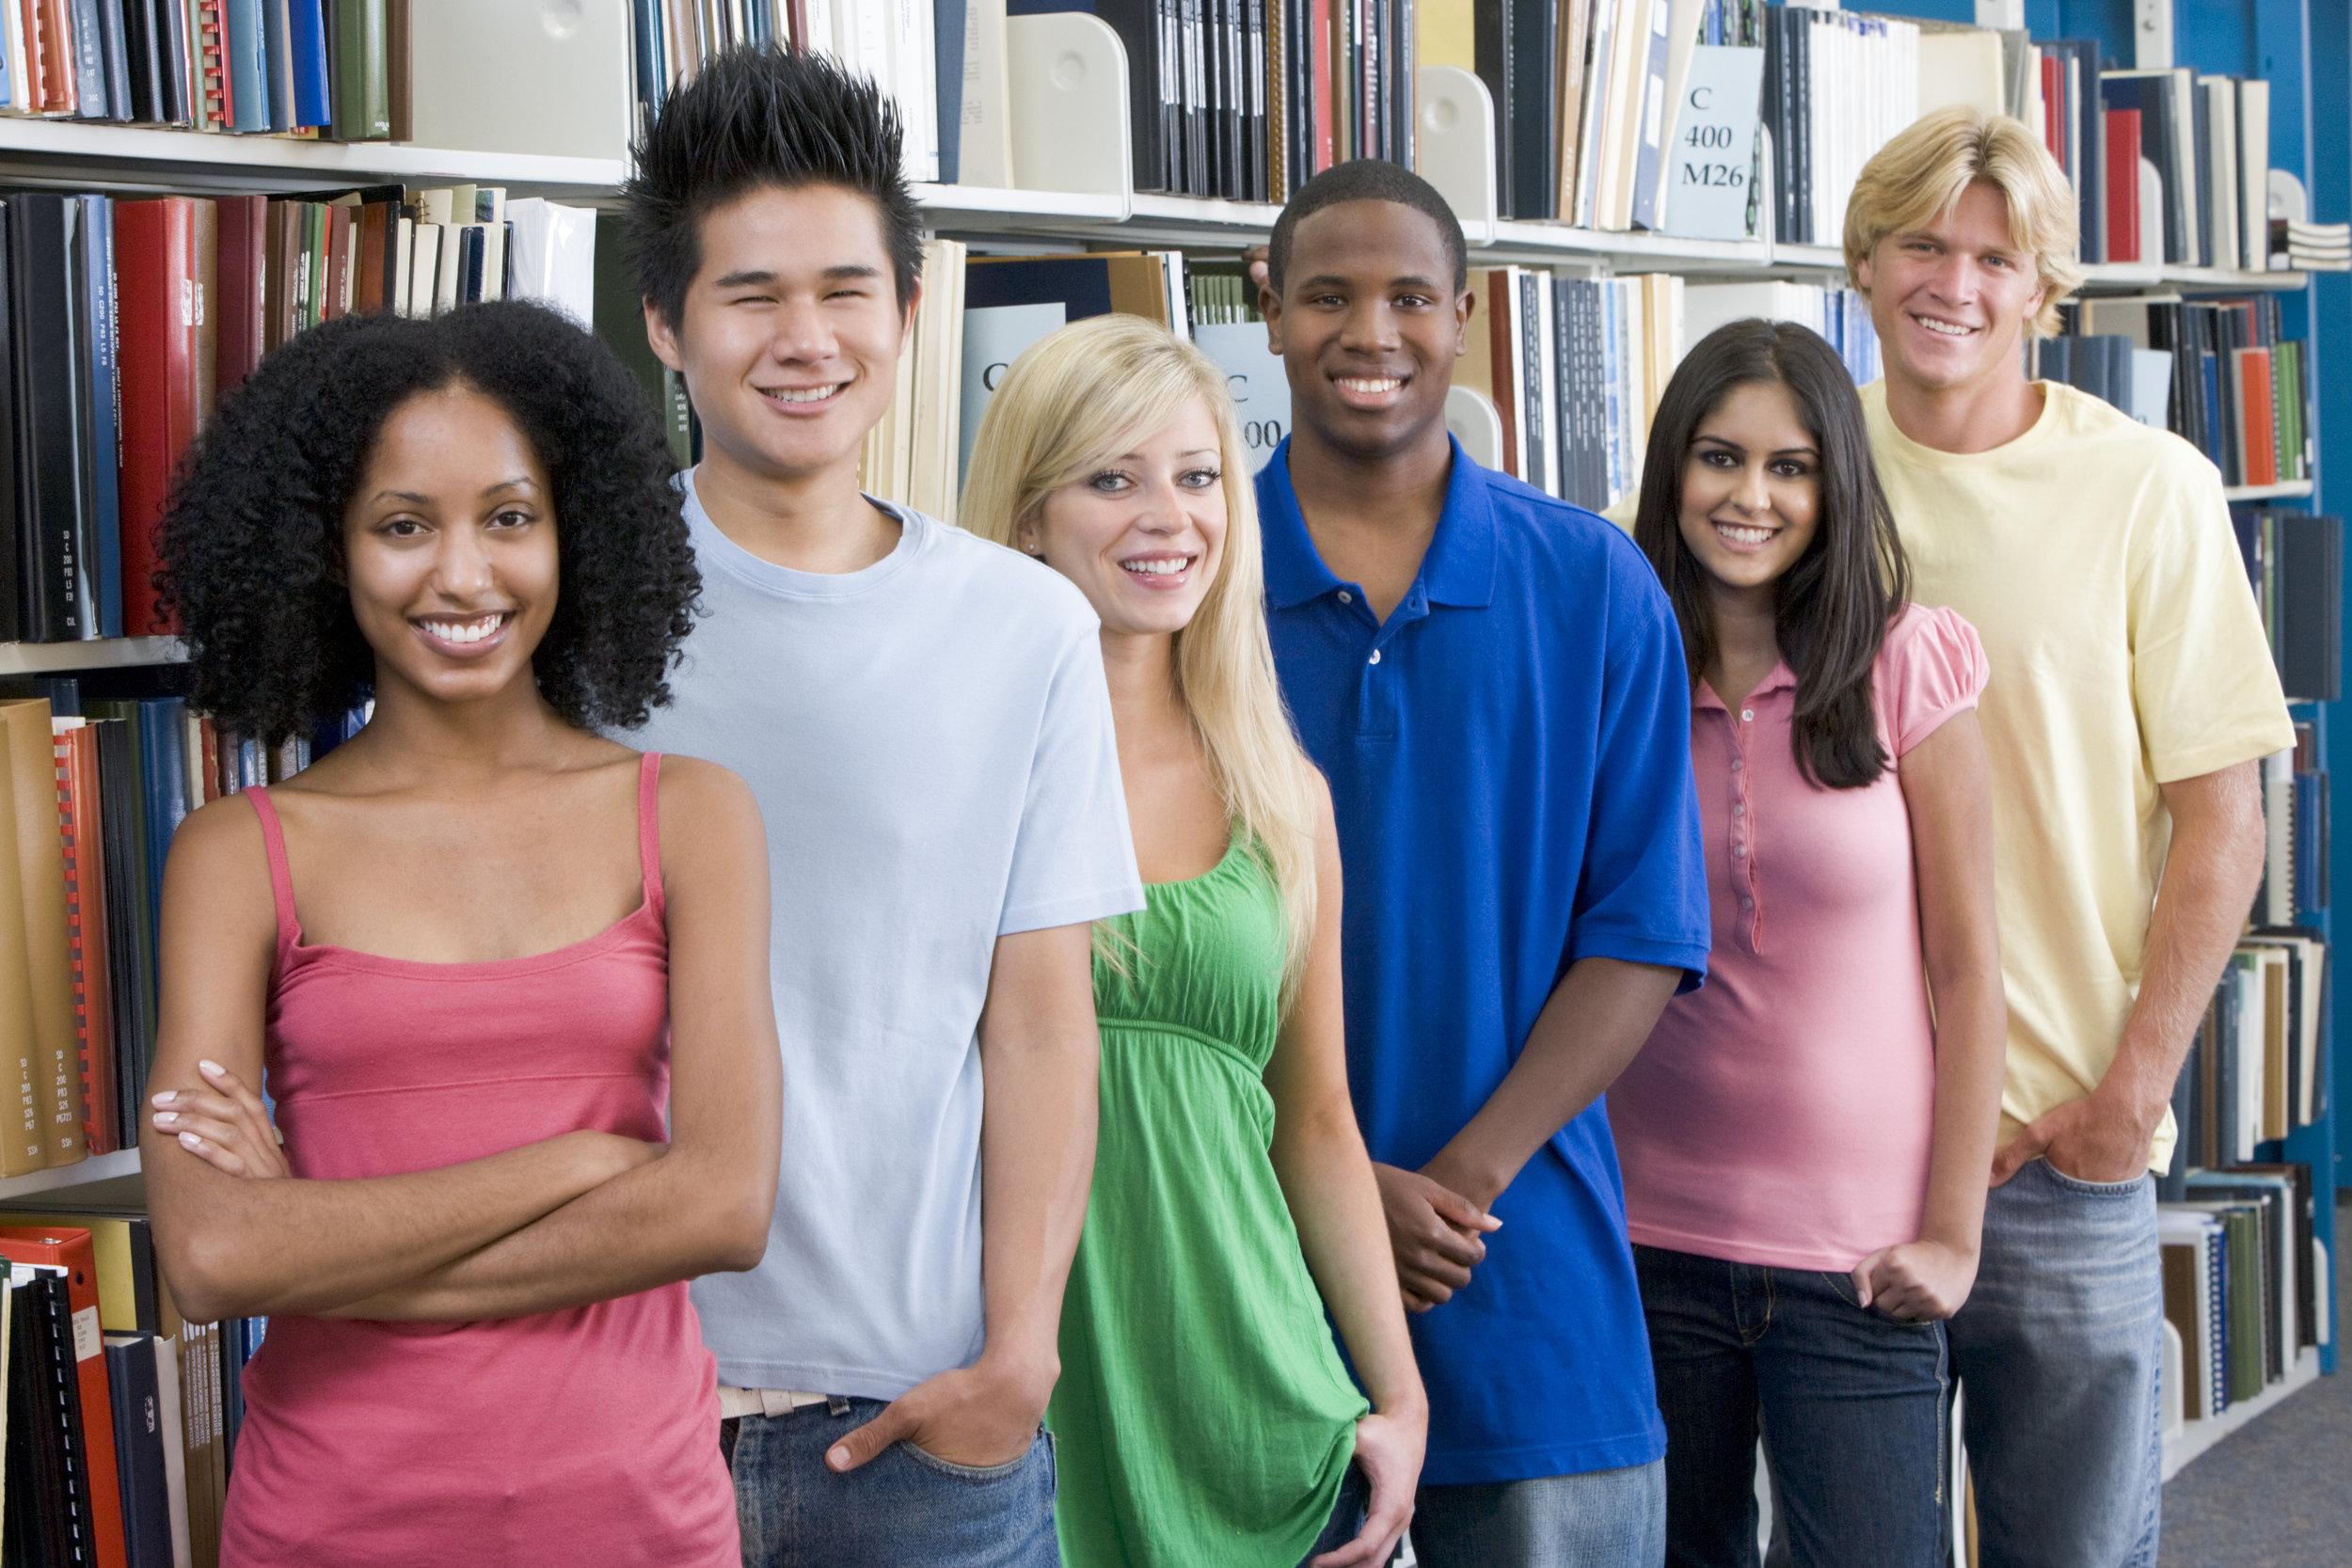 group-of-six-students-standing-in-front-of-library-bookshelves_HKoBzHASo.jpg